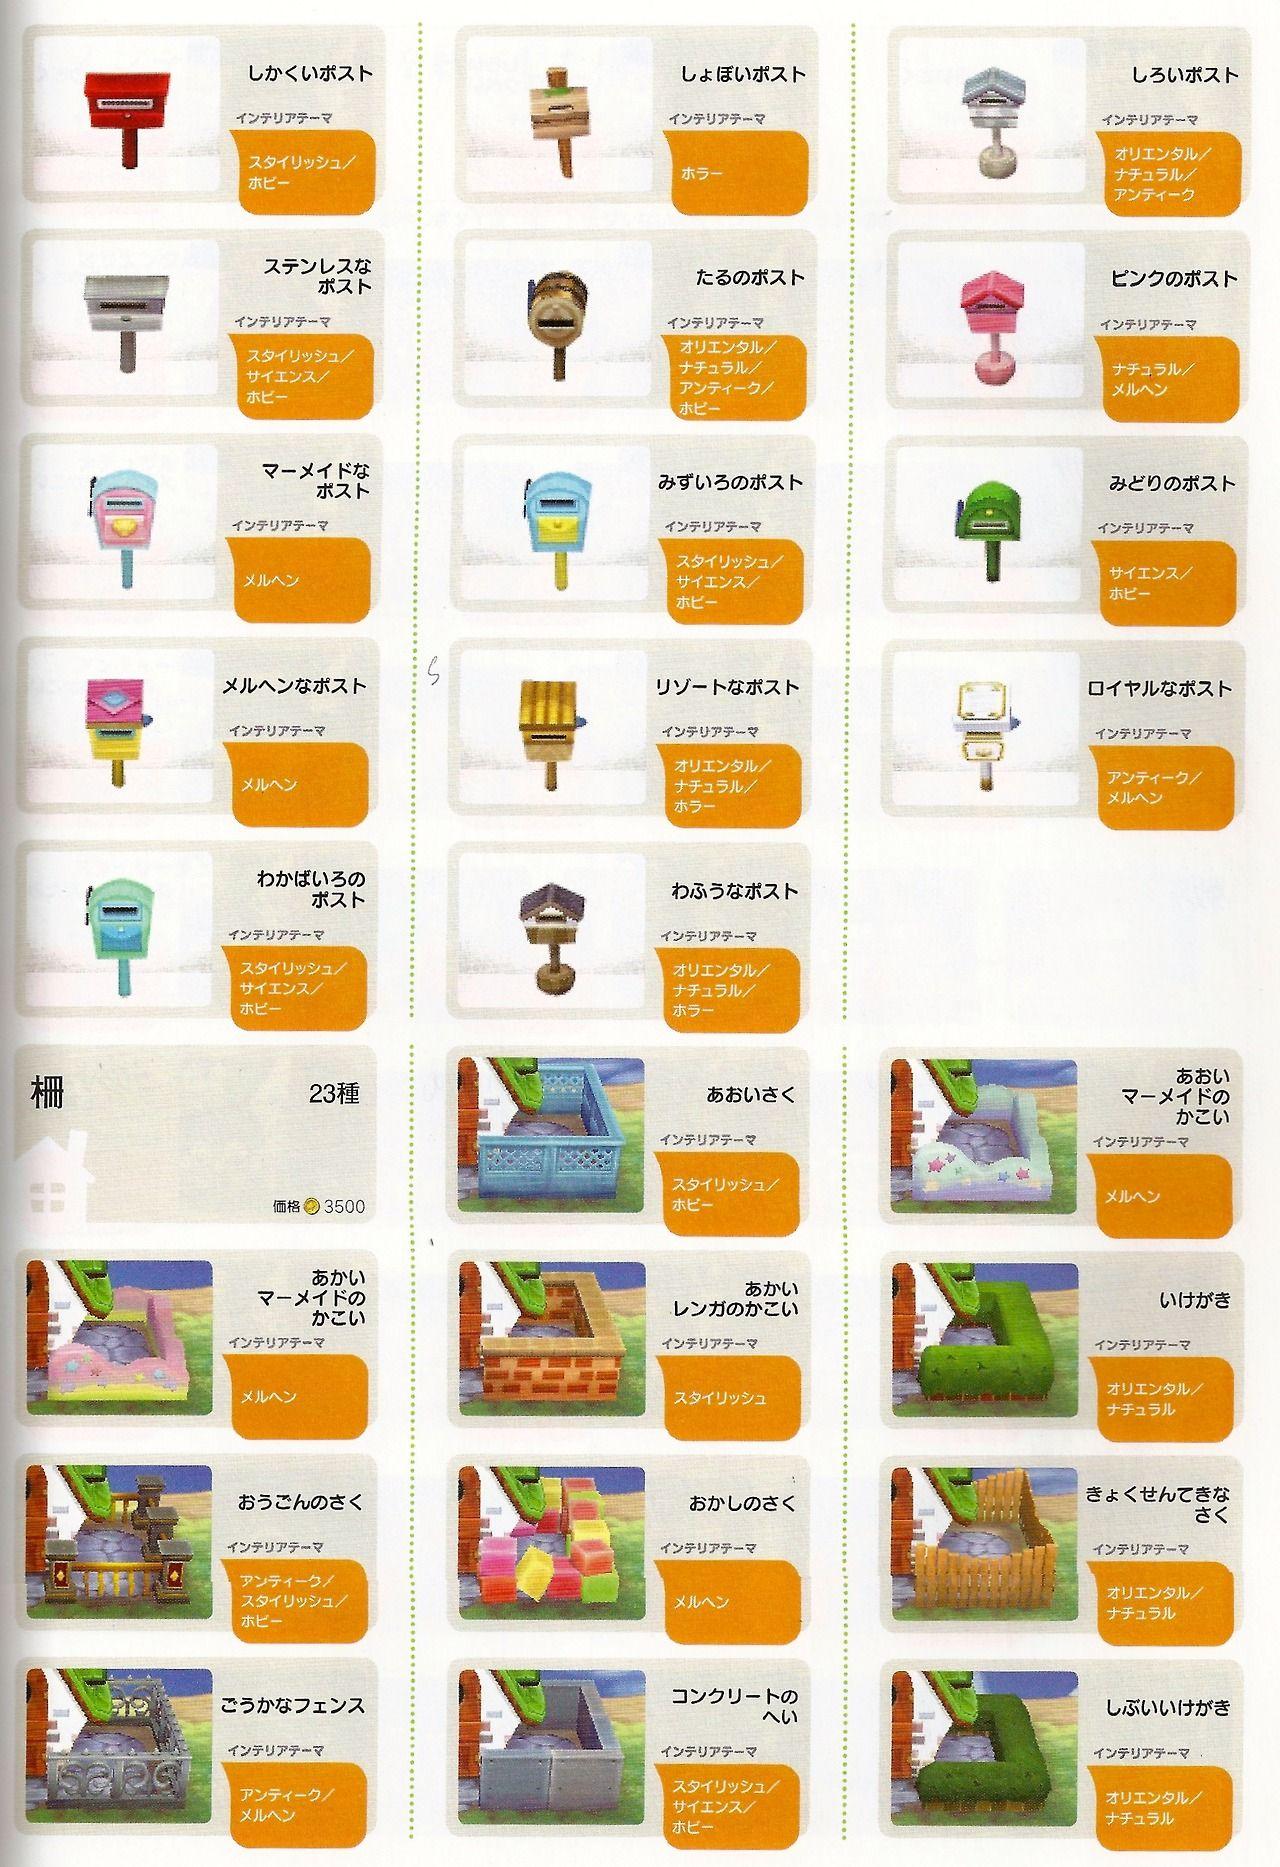 weeradish Animal Crossing New Leaf house exterior options